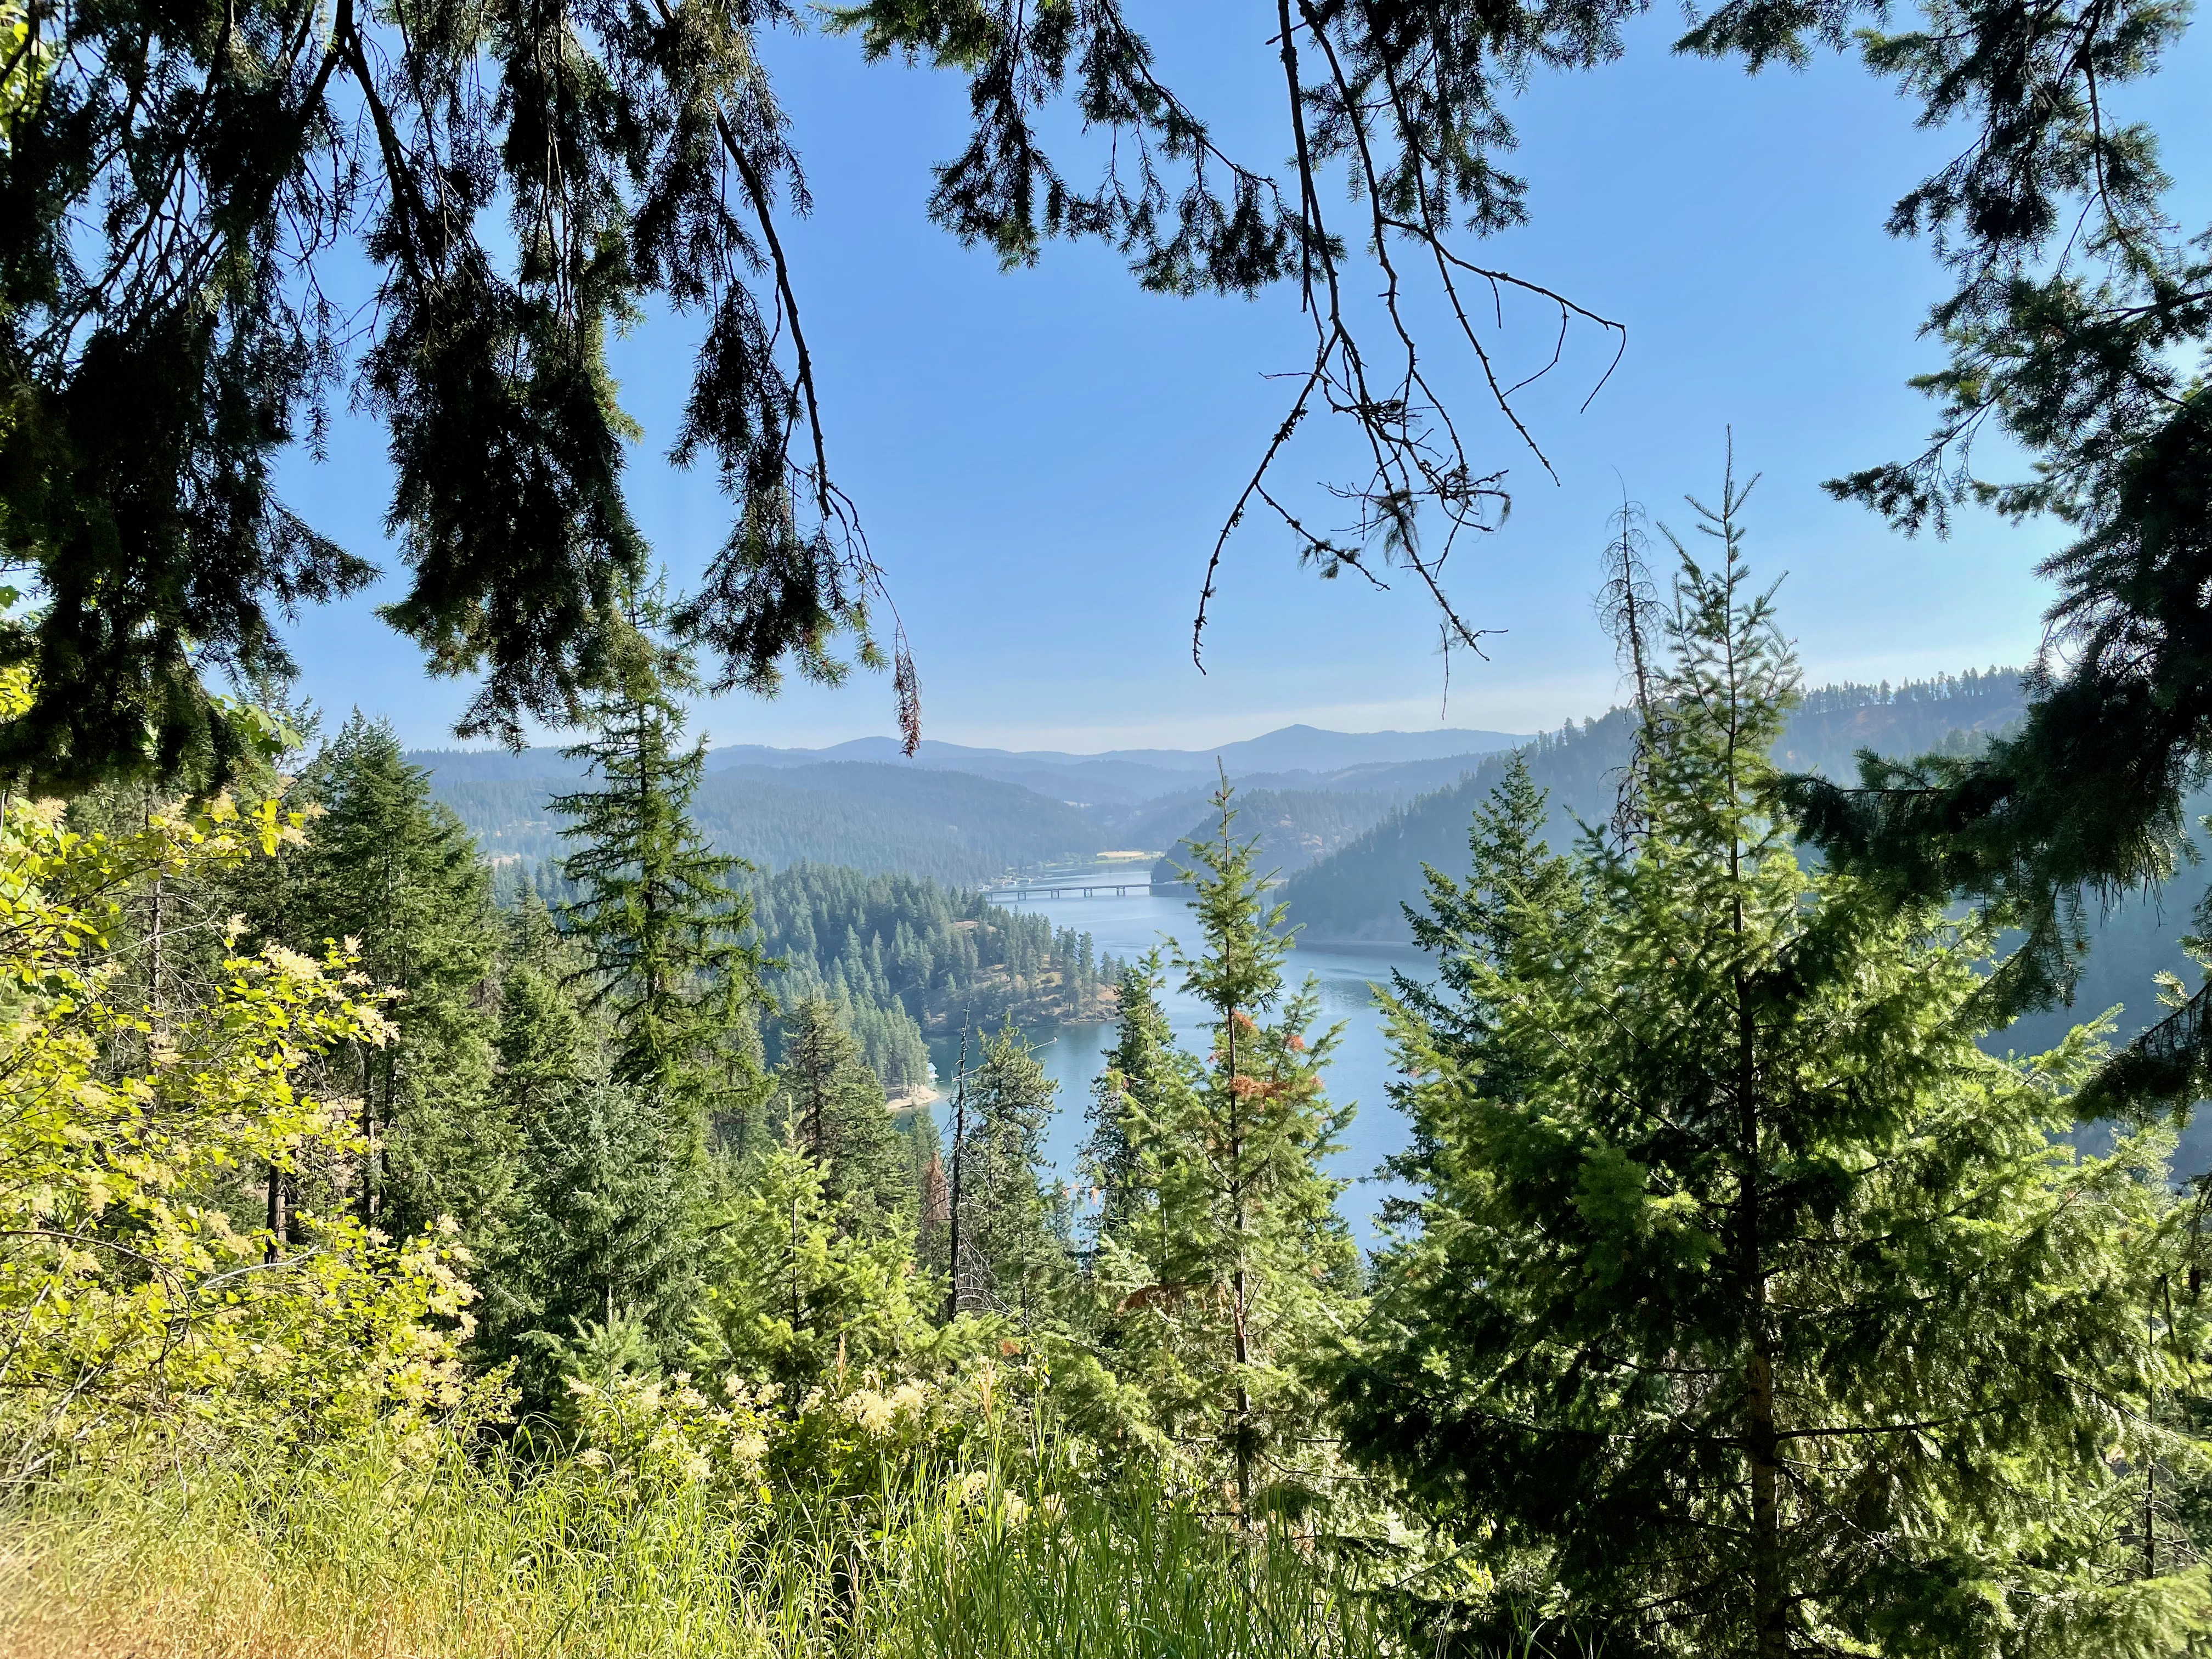 High above lake Coeur d'Alene